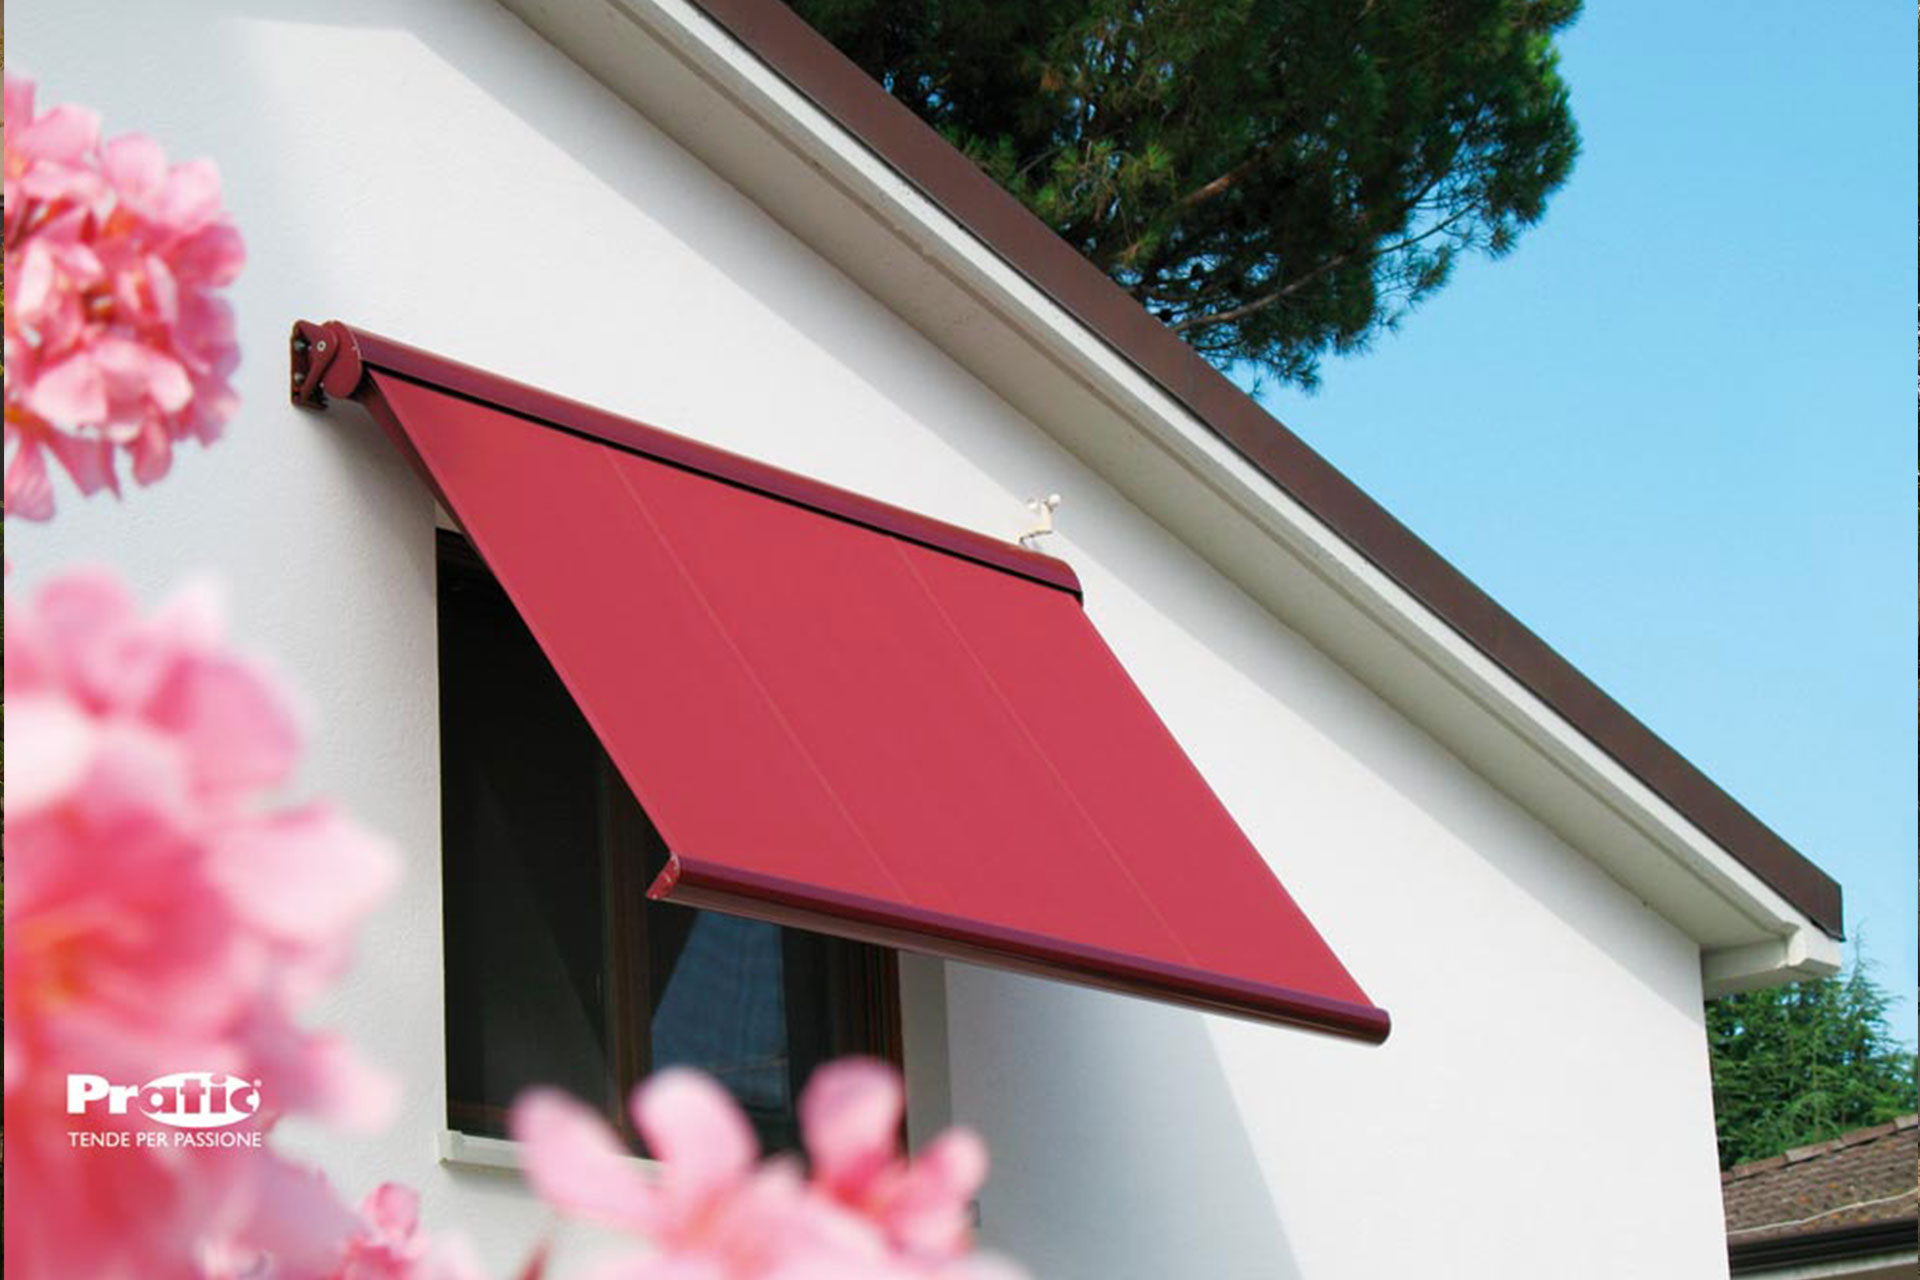 tende oscuranti albo serramenti alluminio pratic rosse pn